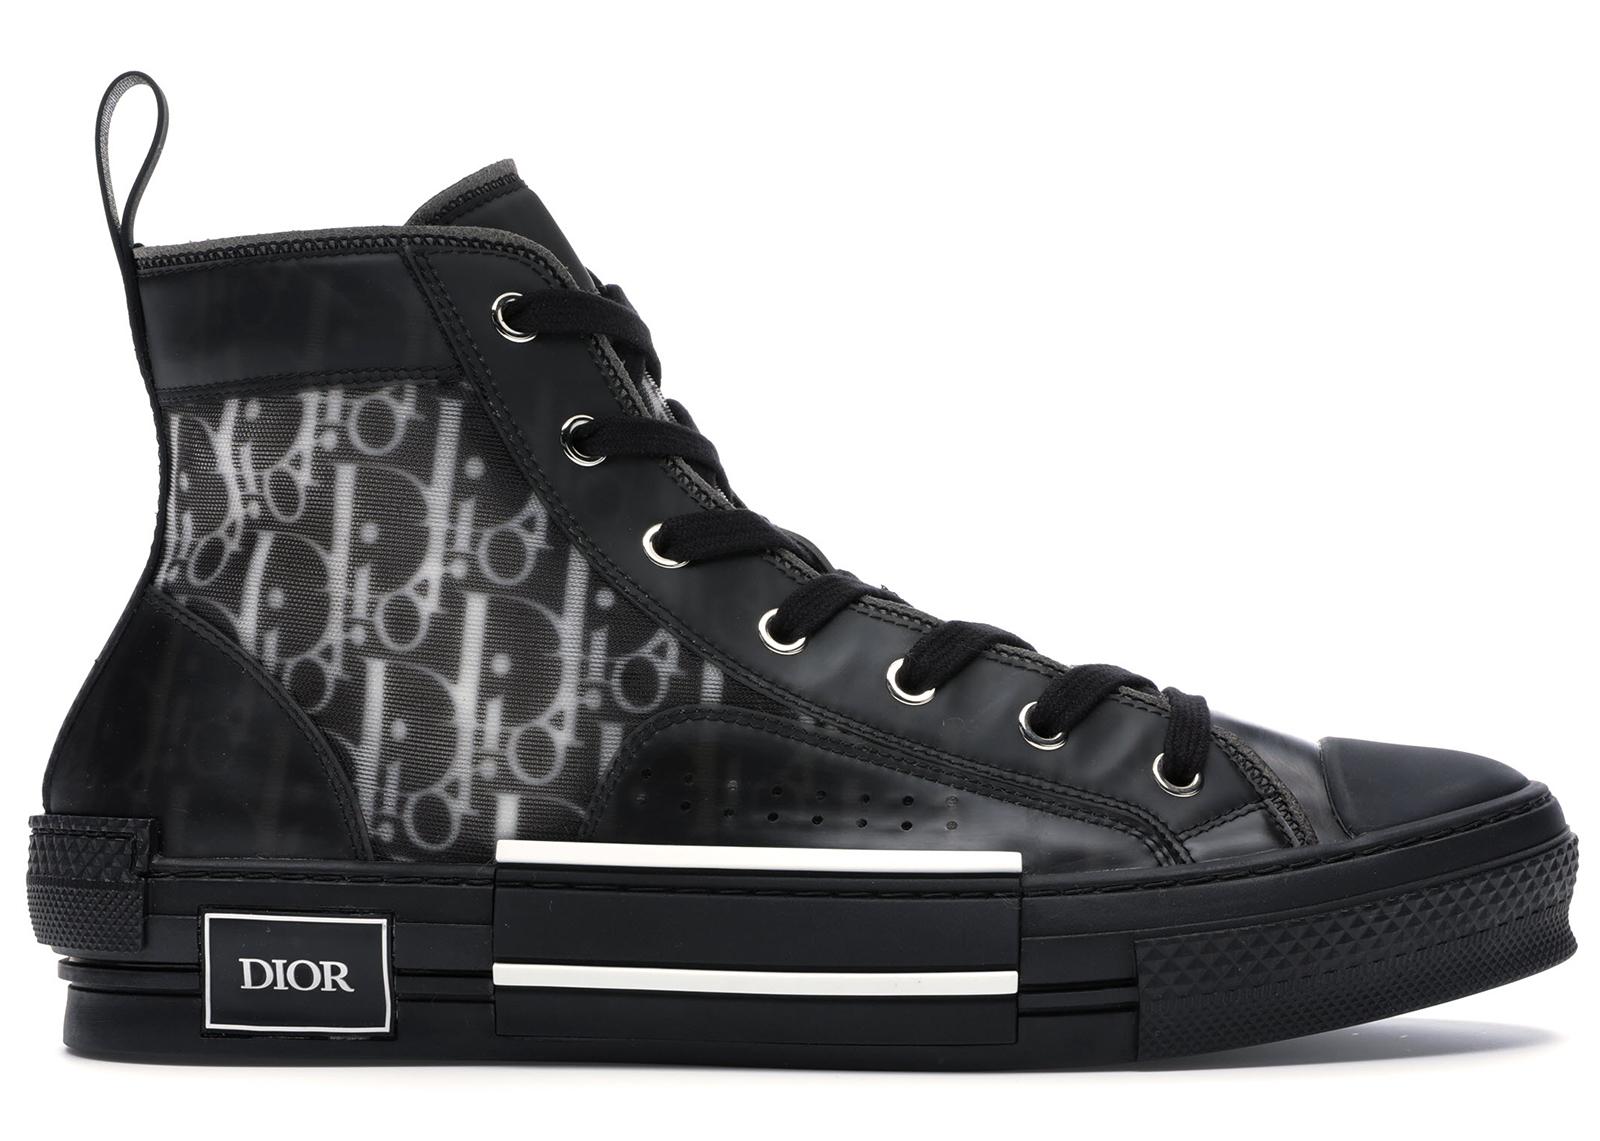 Buy Dior Shoes & Deadstock Sneakers